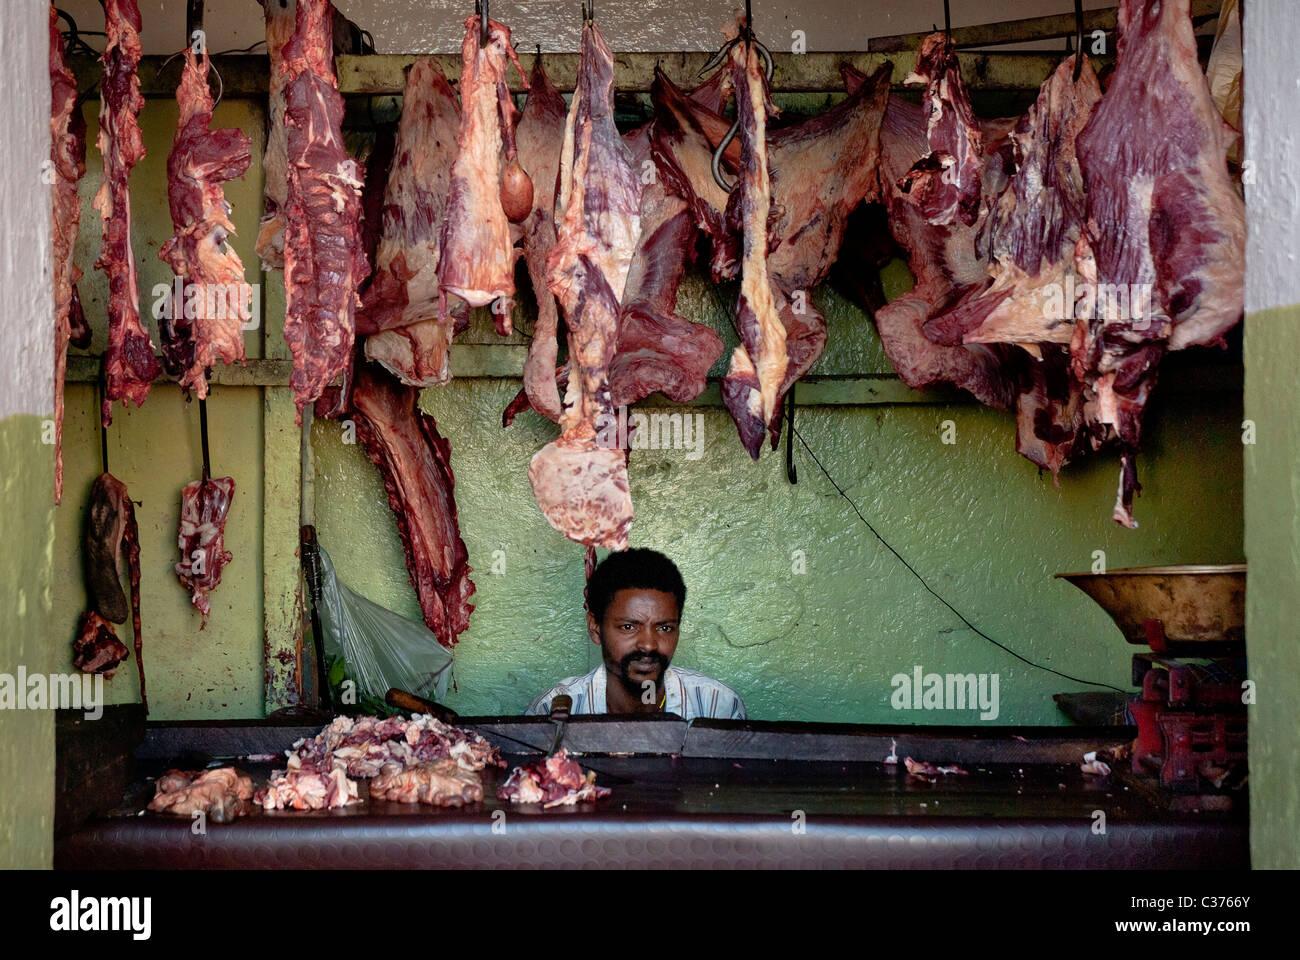 butcher shop in harar ethiopia - Stock Image